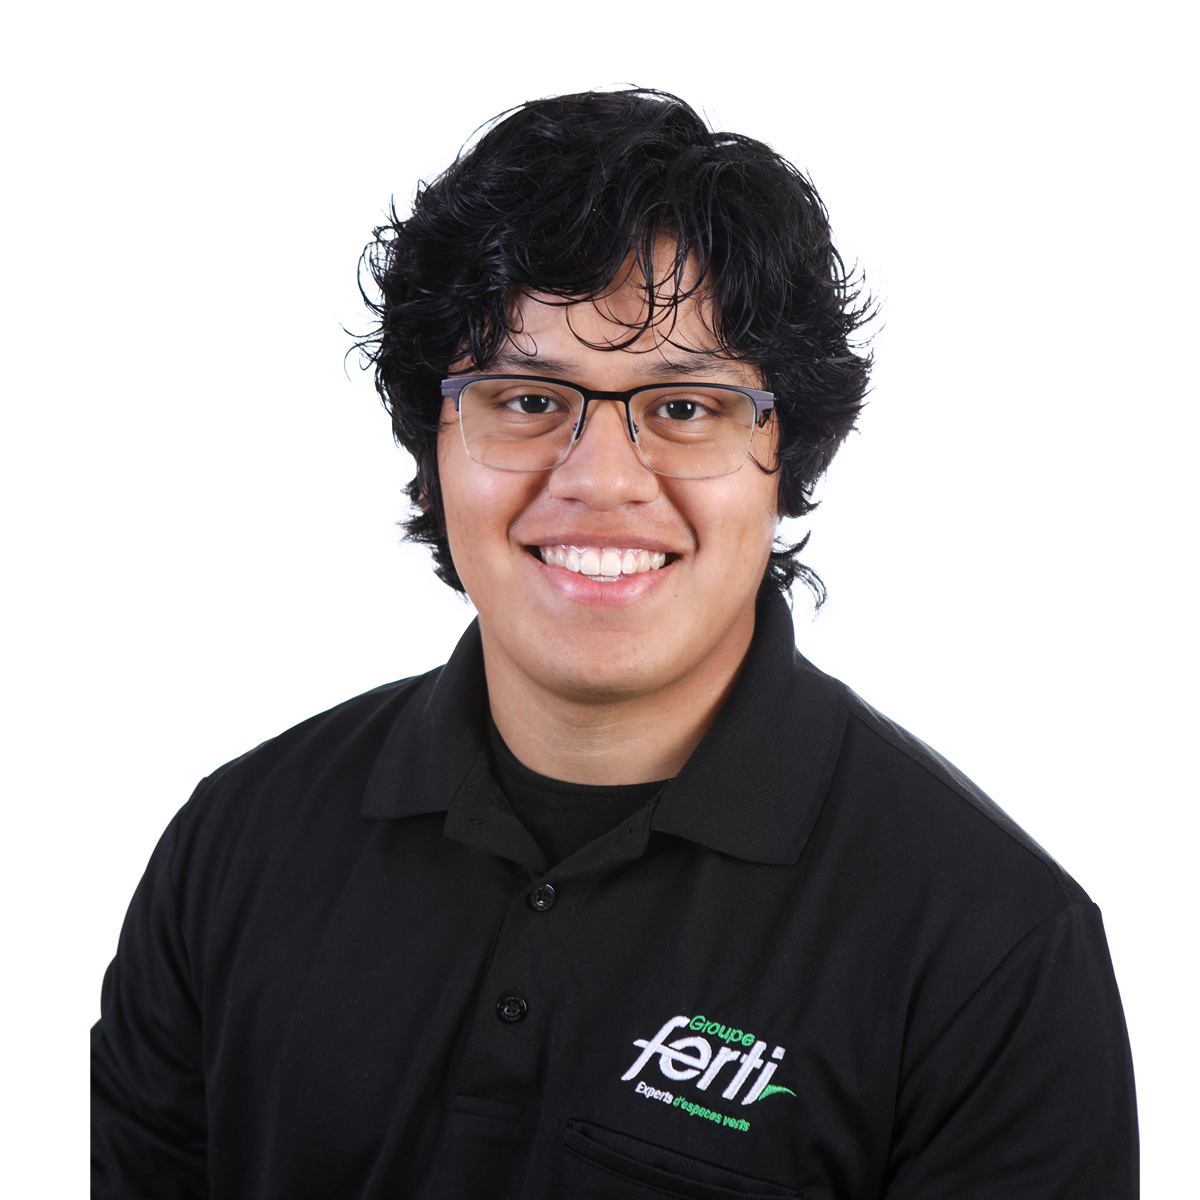 Hector Fabio Acunstar Technicien en horticultur